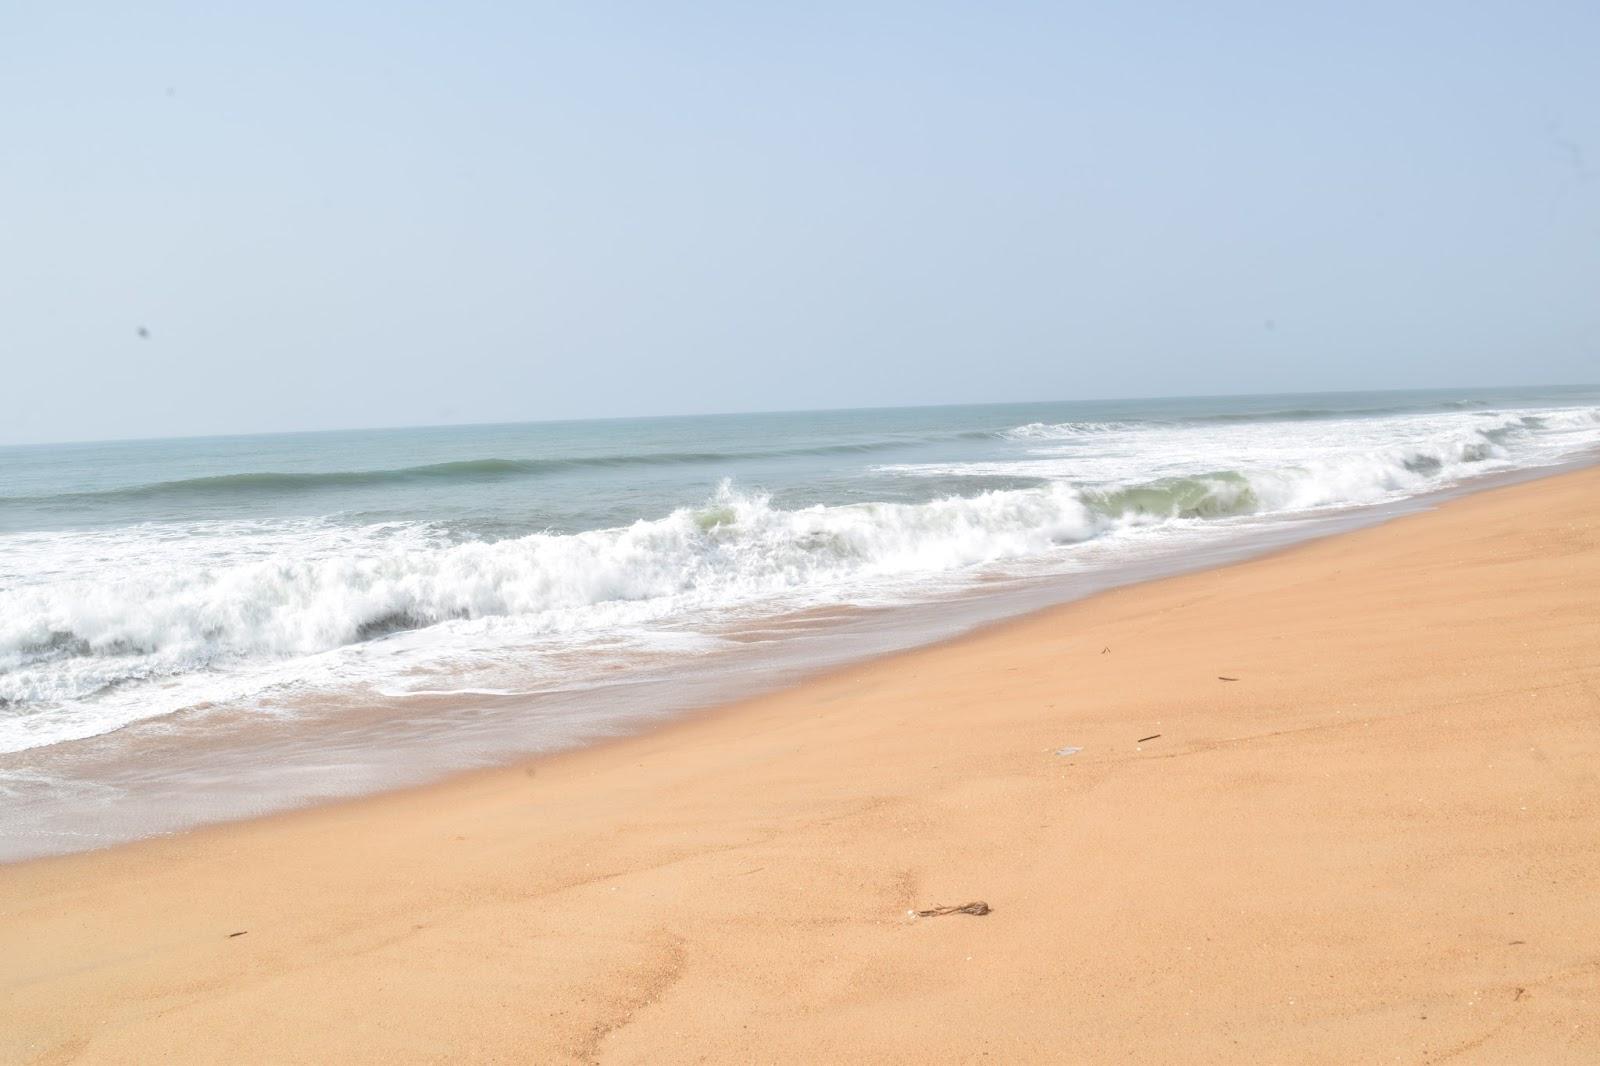 Benin Republic beach